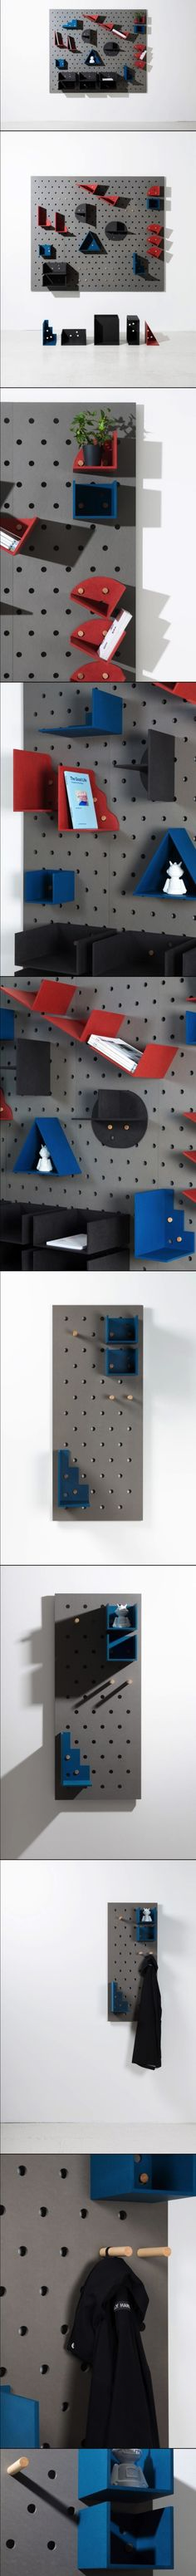 Plakativ: A Wall-Mounted Modular Shelving System